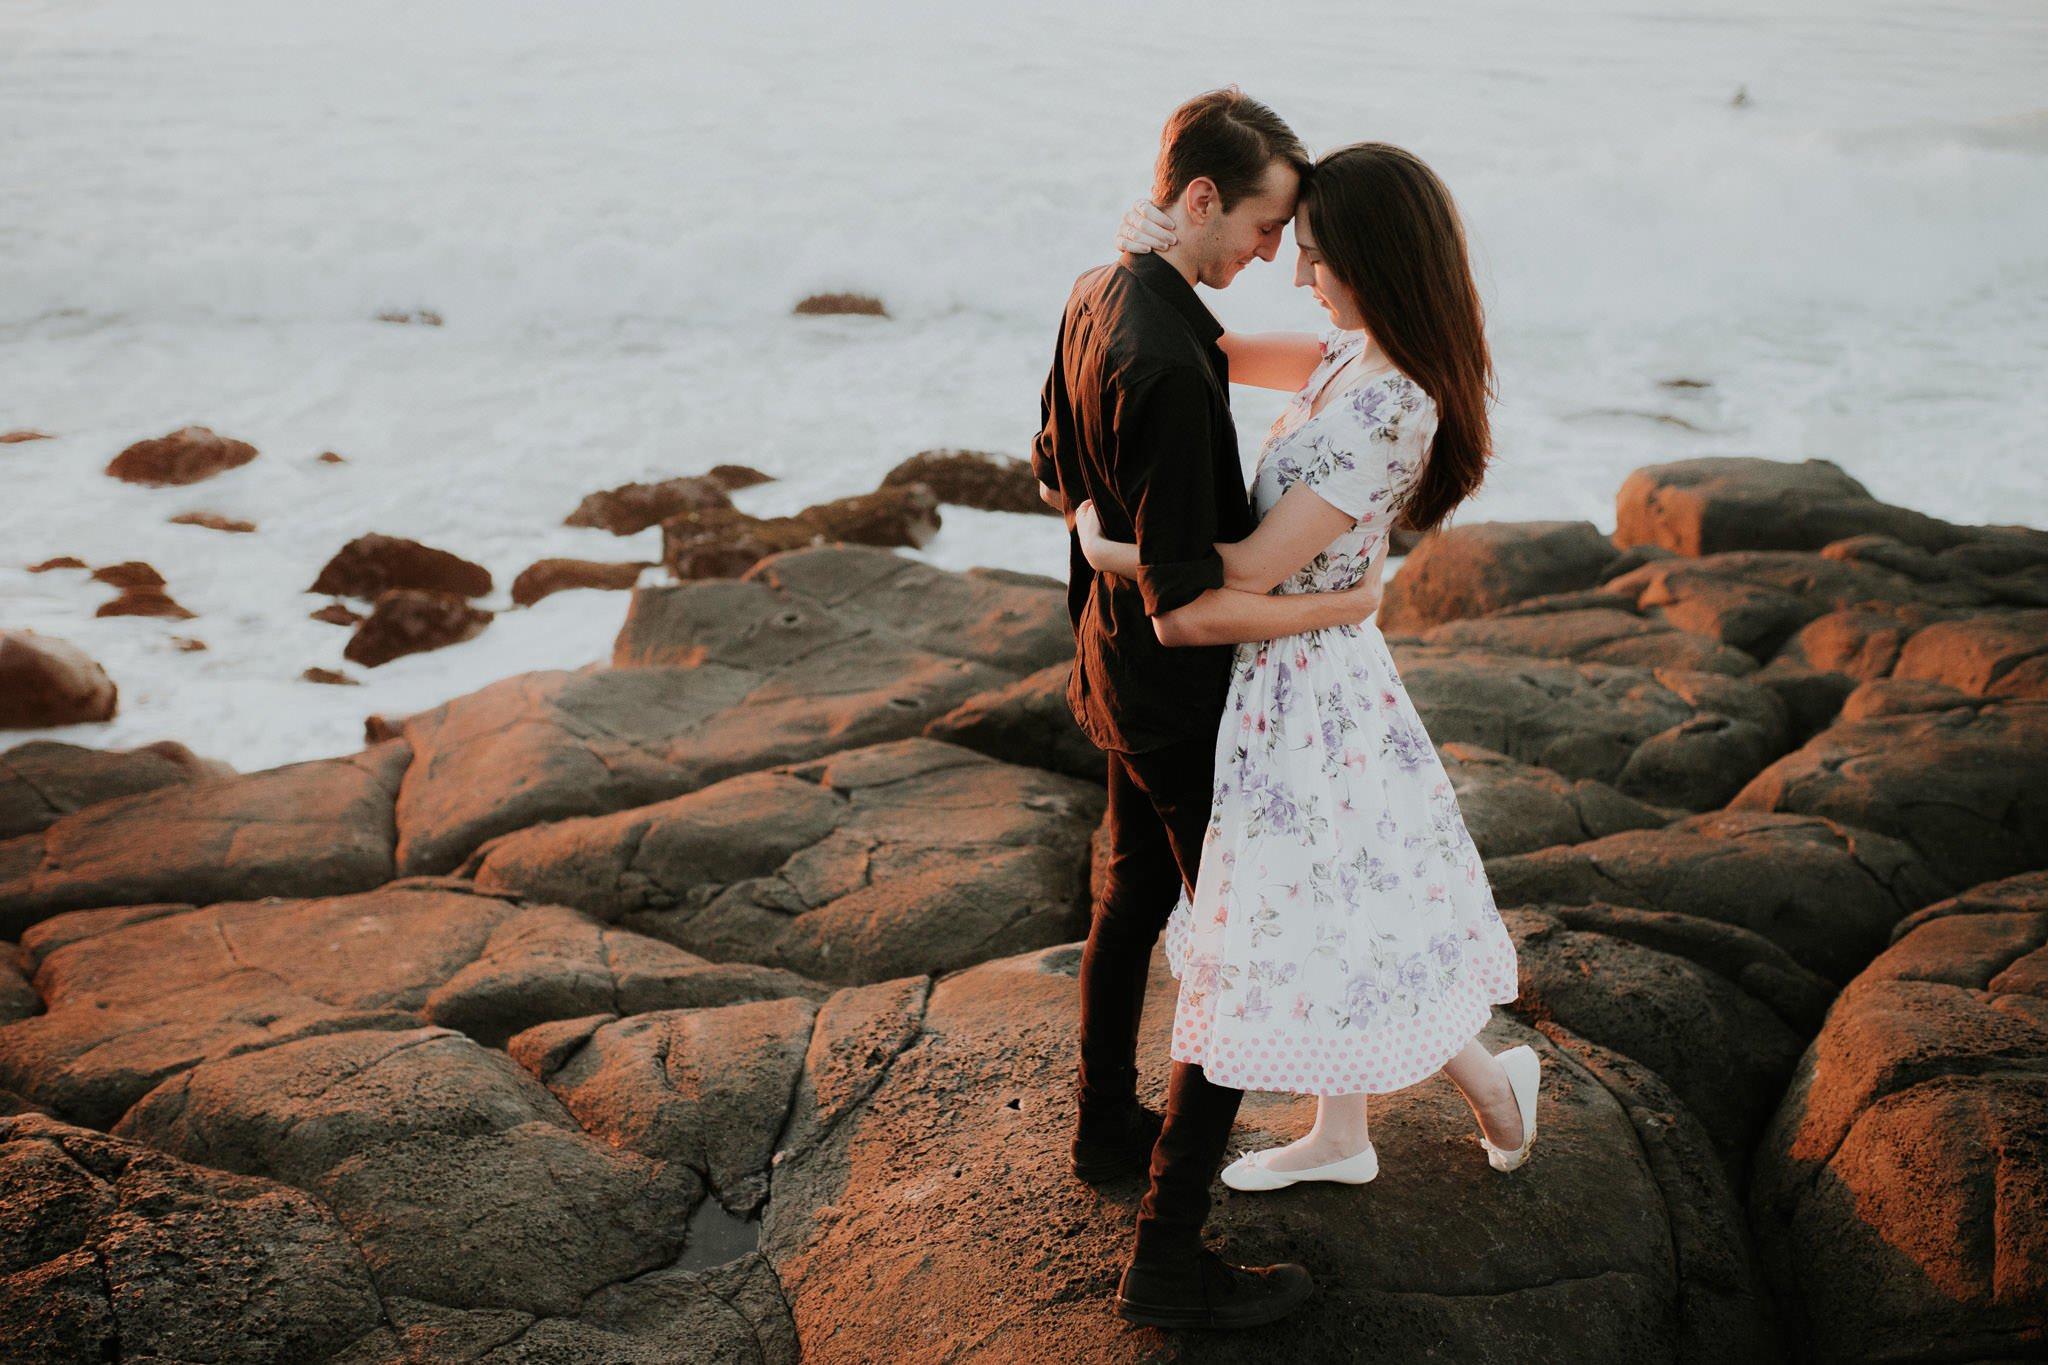 wedding photographer hamilton new zealand 1013 4